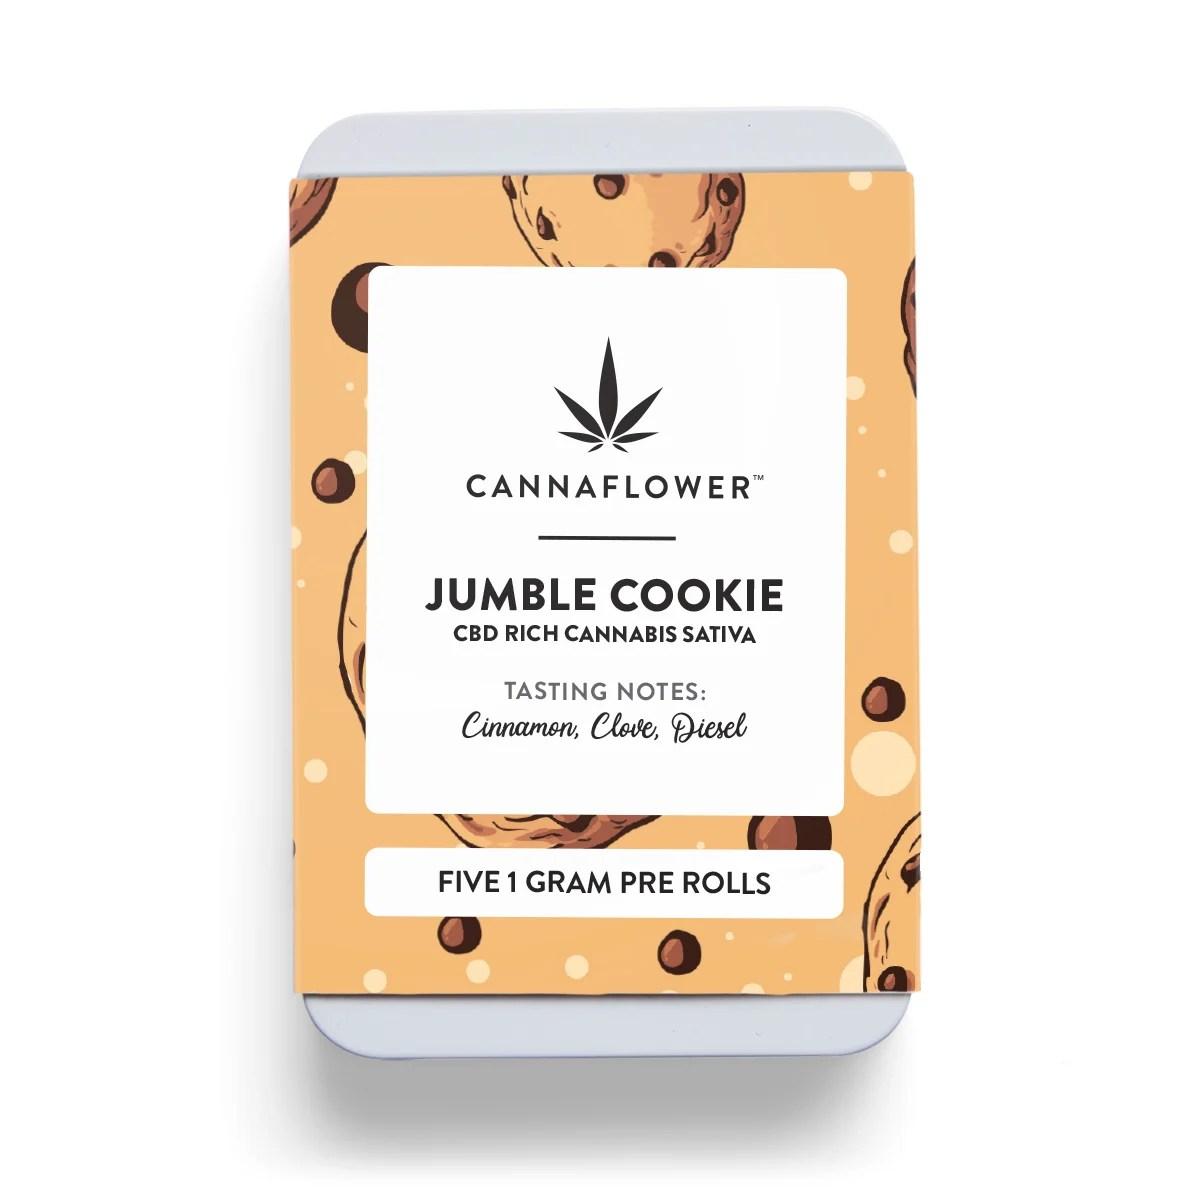 Cannaflower Jumble Cookie 5 Pac